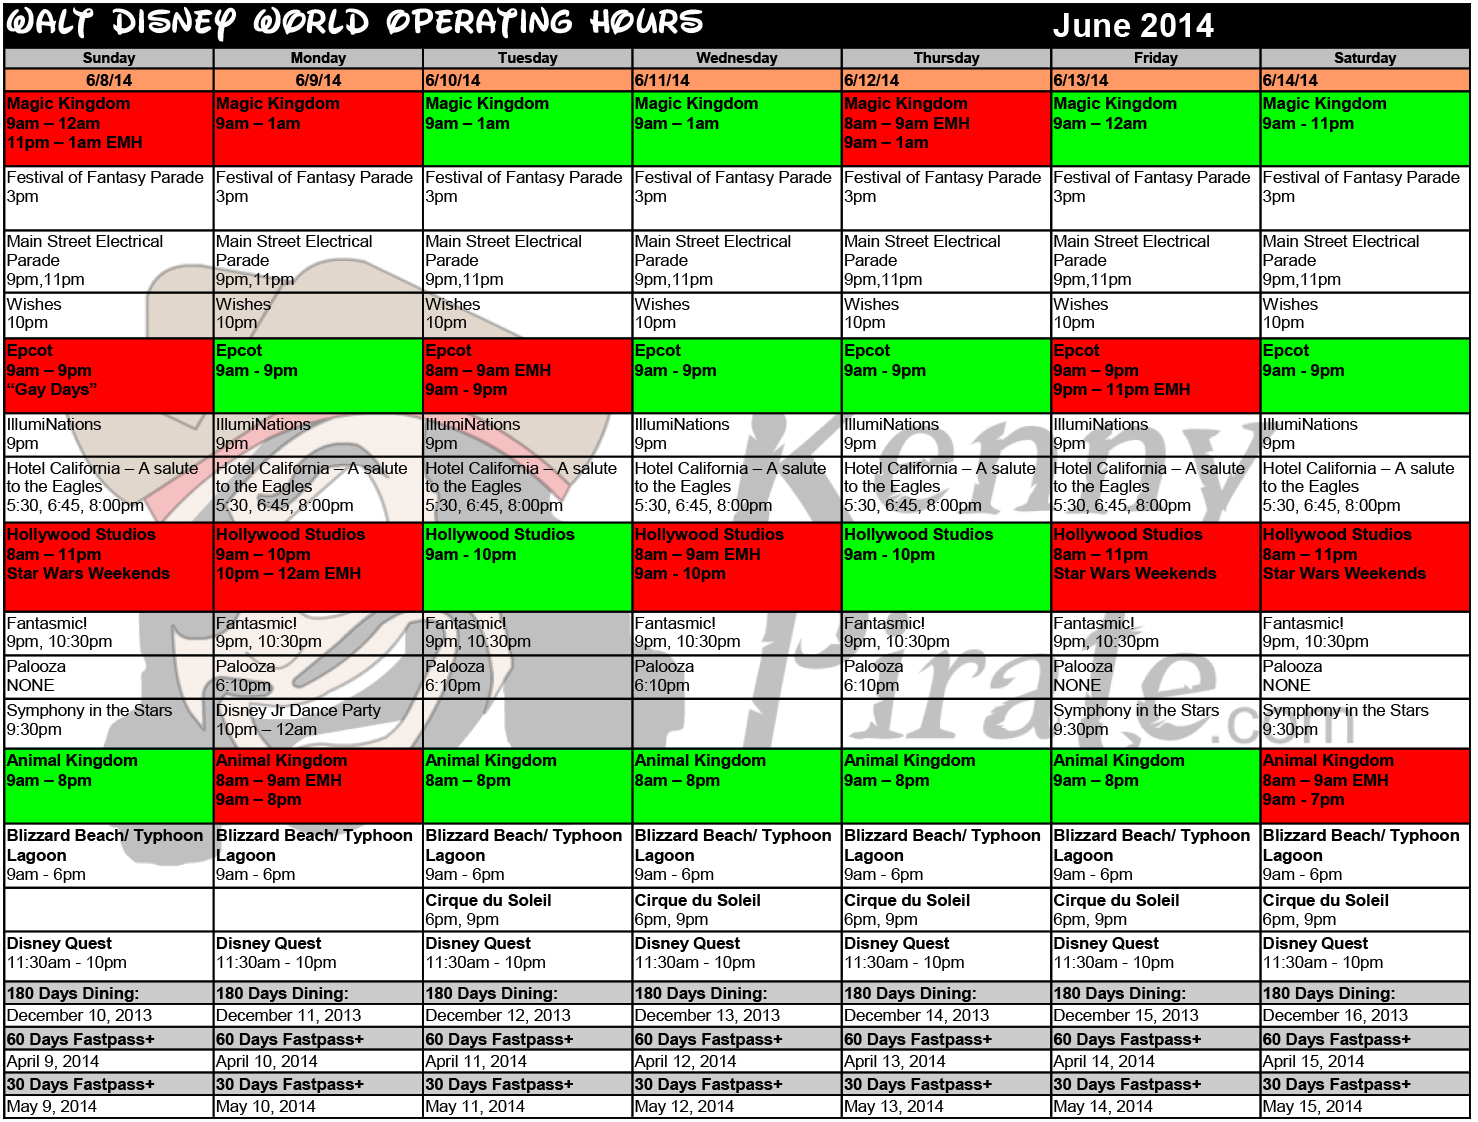 Walt Disney World Crowd Calendar 2014